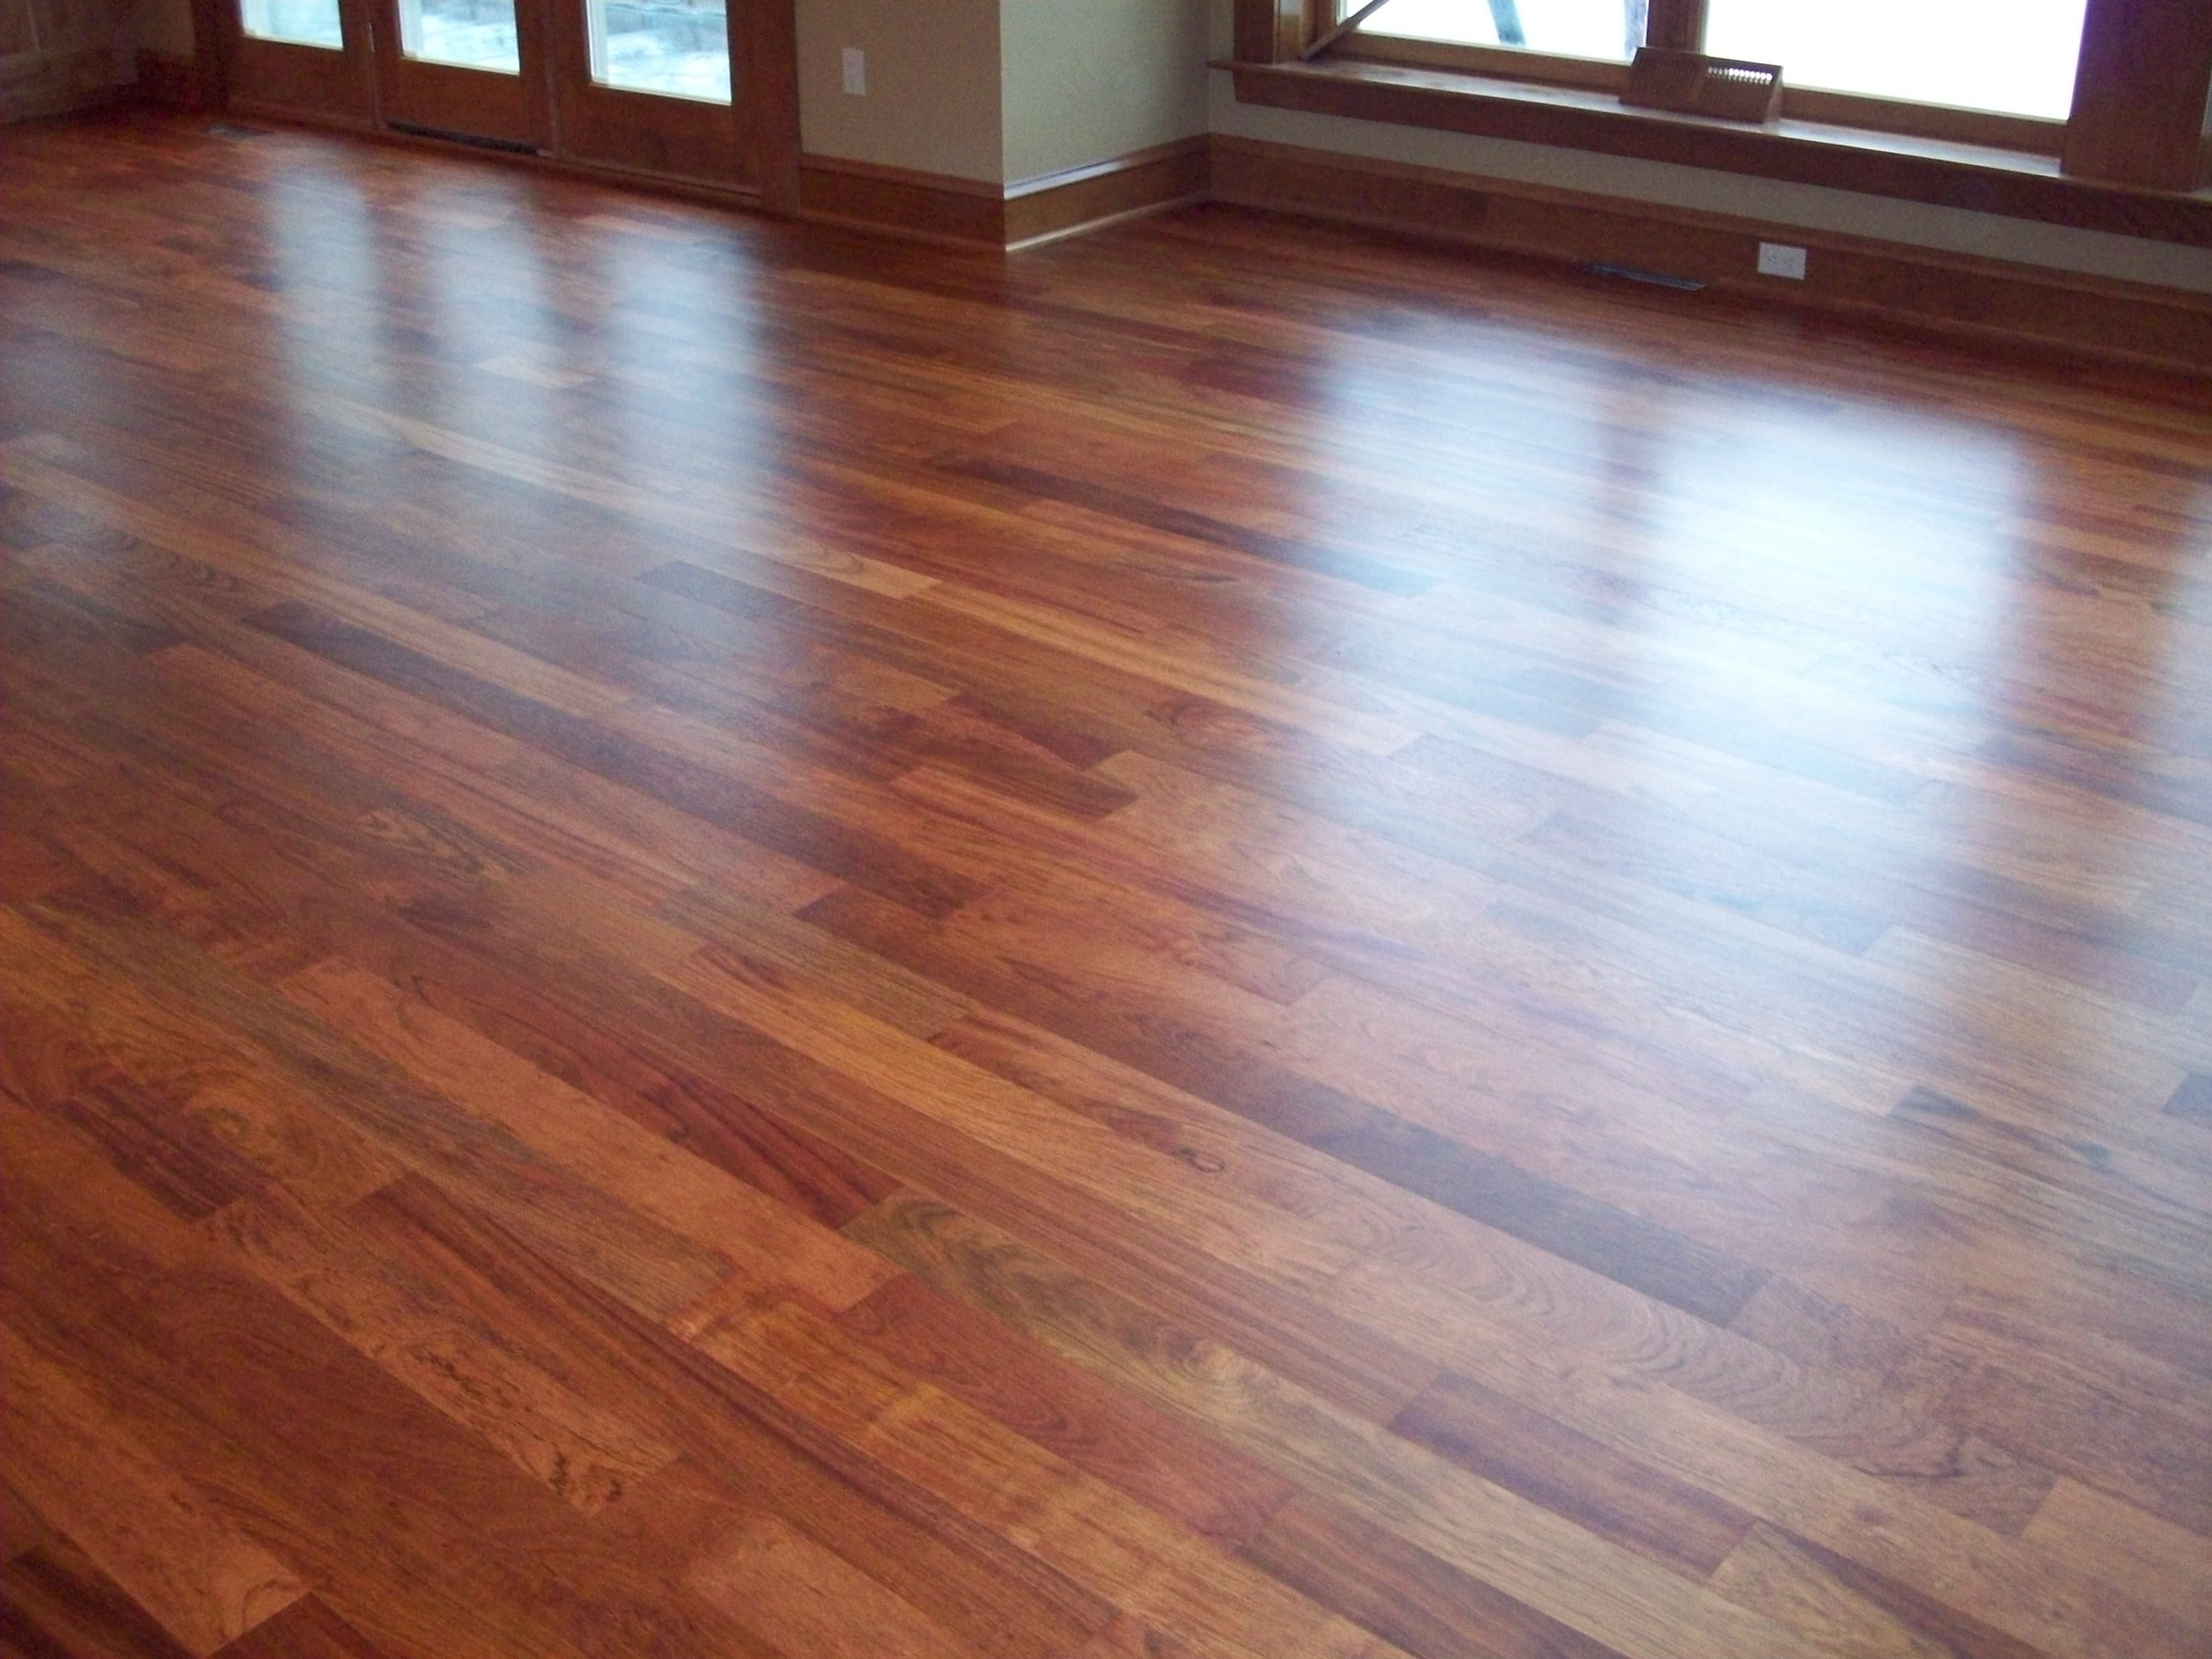 hardwood flooring san jose of 15 luxury steam mop for hardwood floors stock dizpos com within best steam cleaner for laminate wood floors